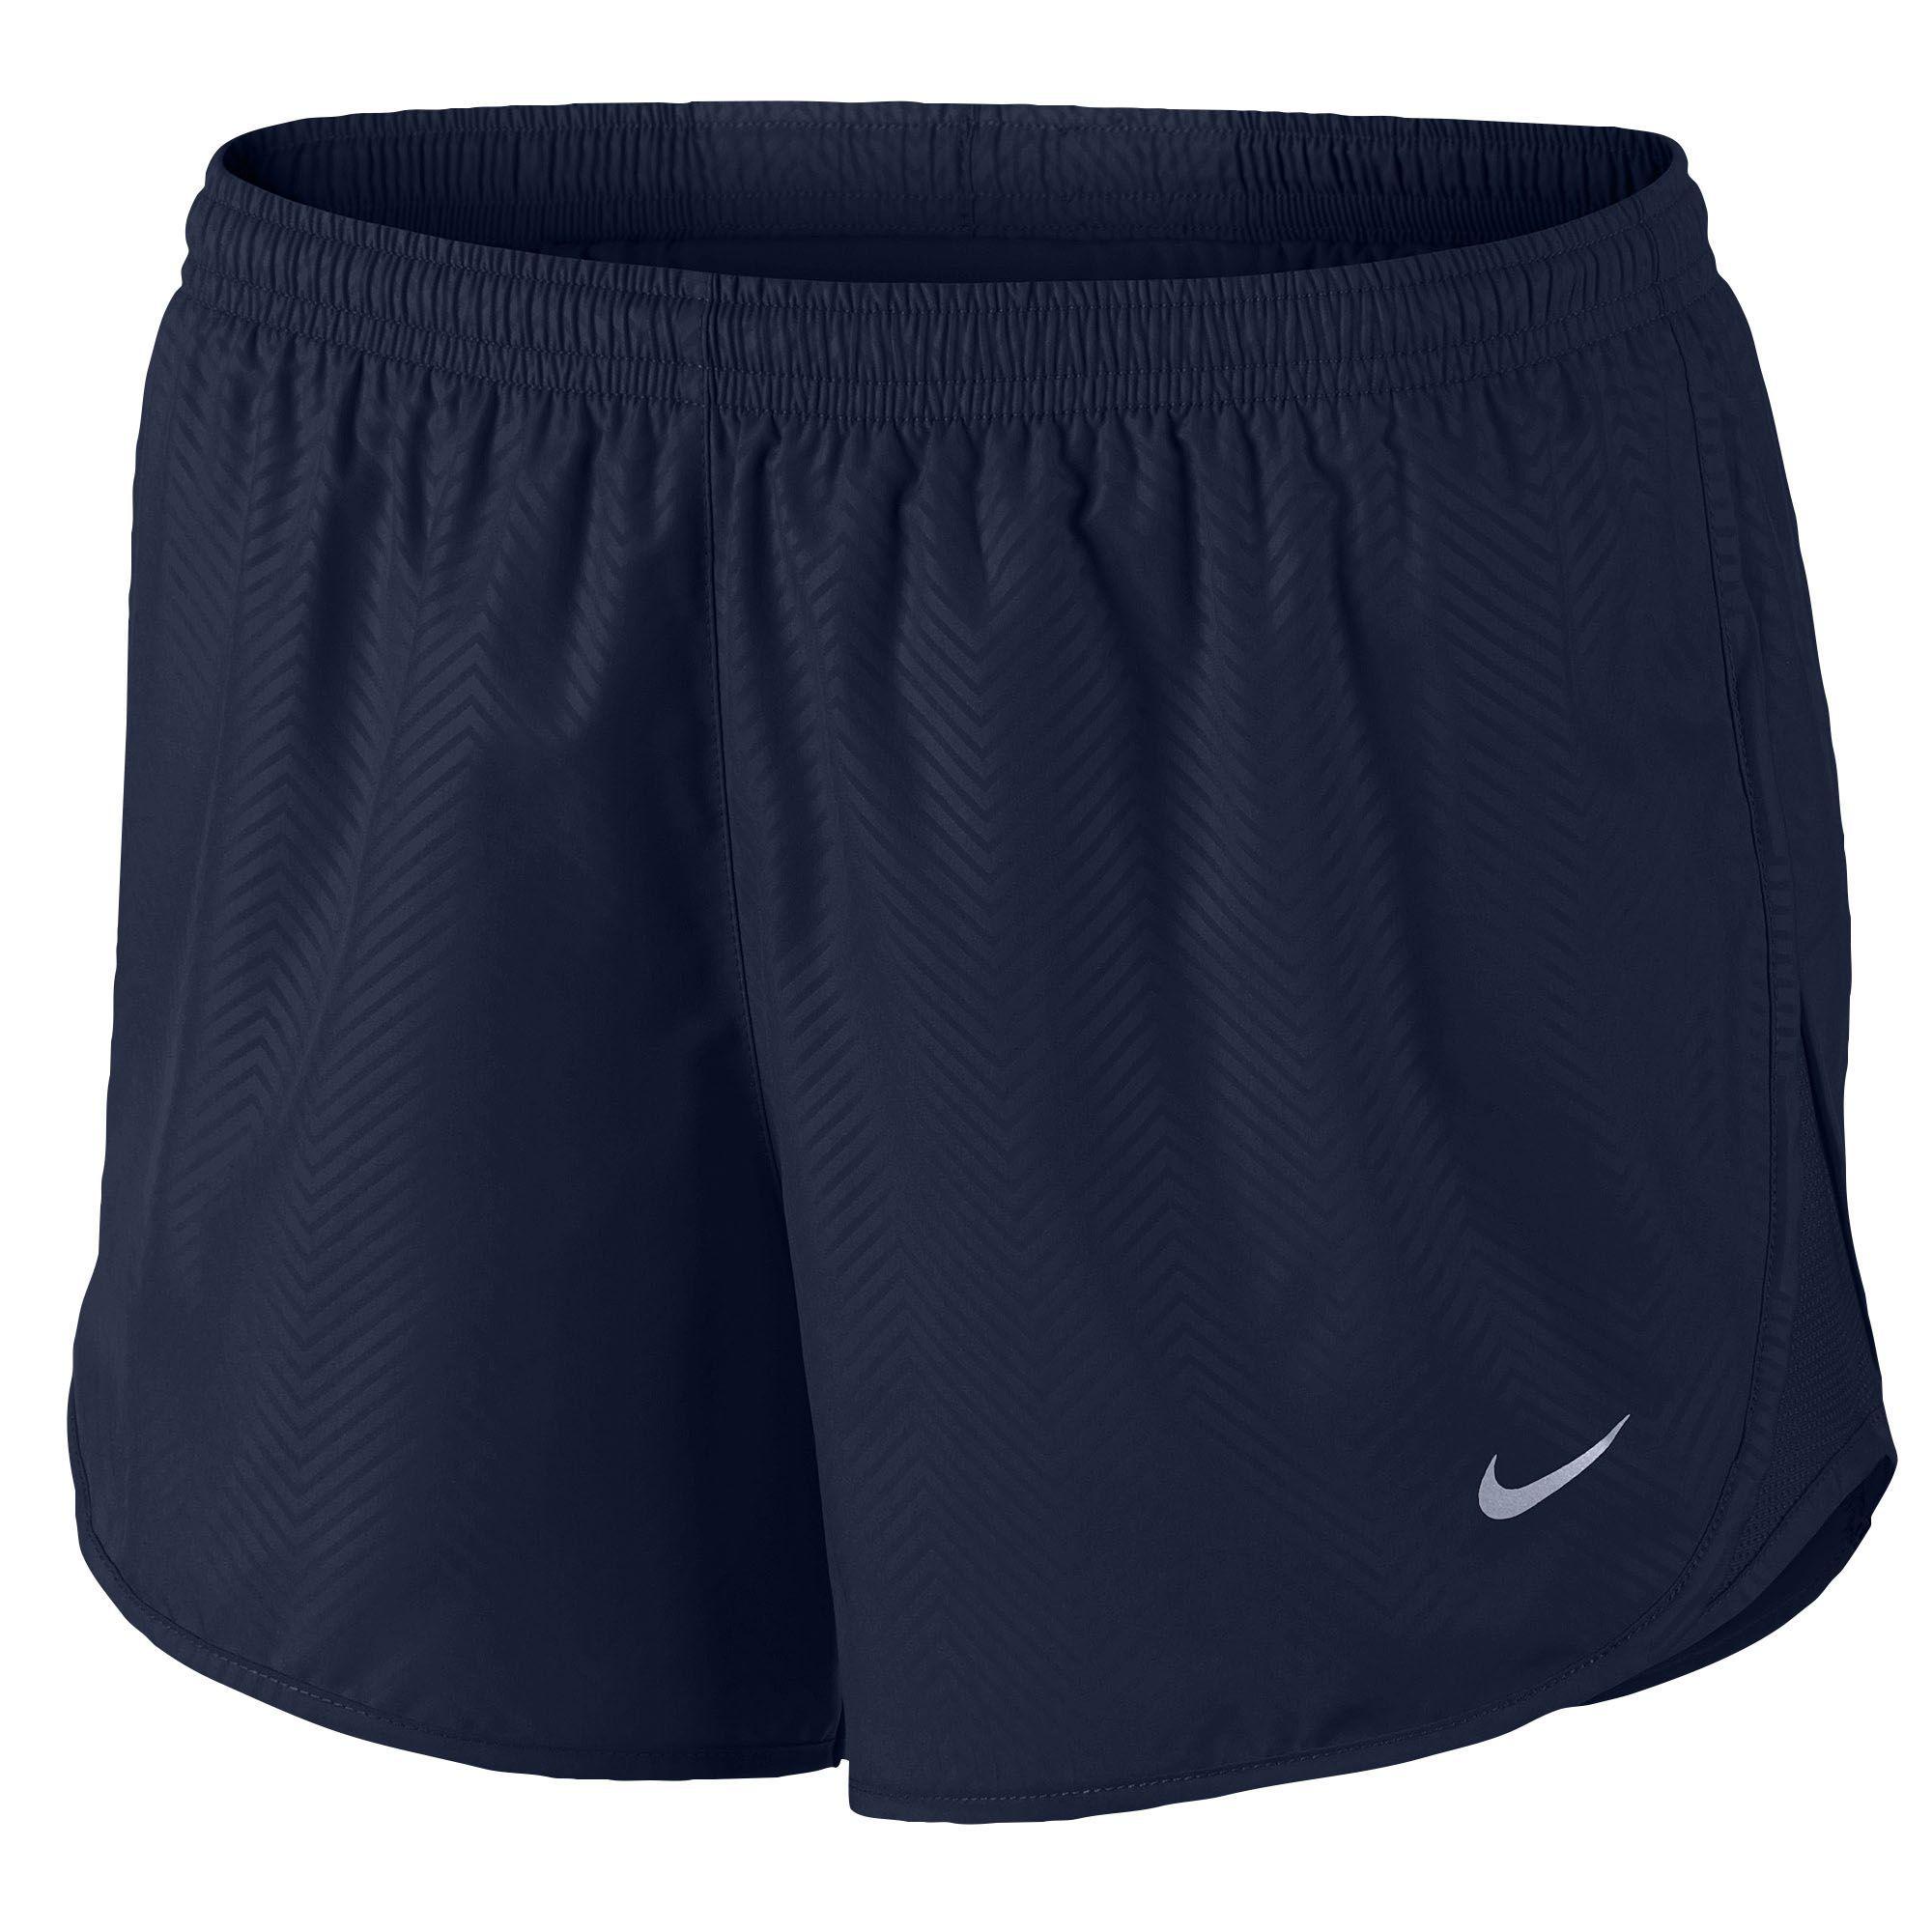 Nike drifit 35 running shorts women running women